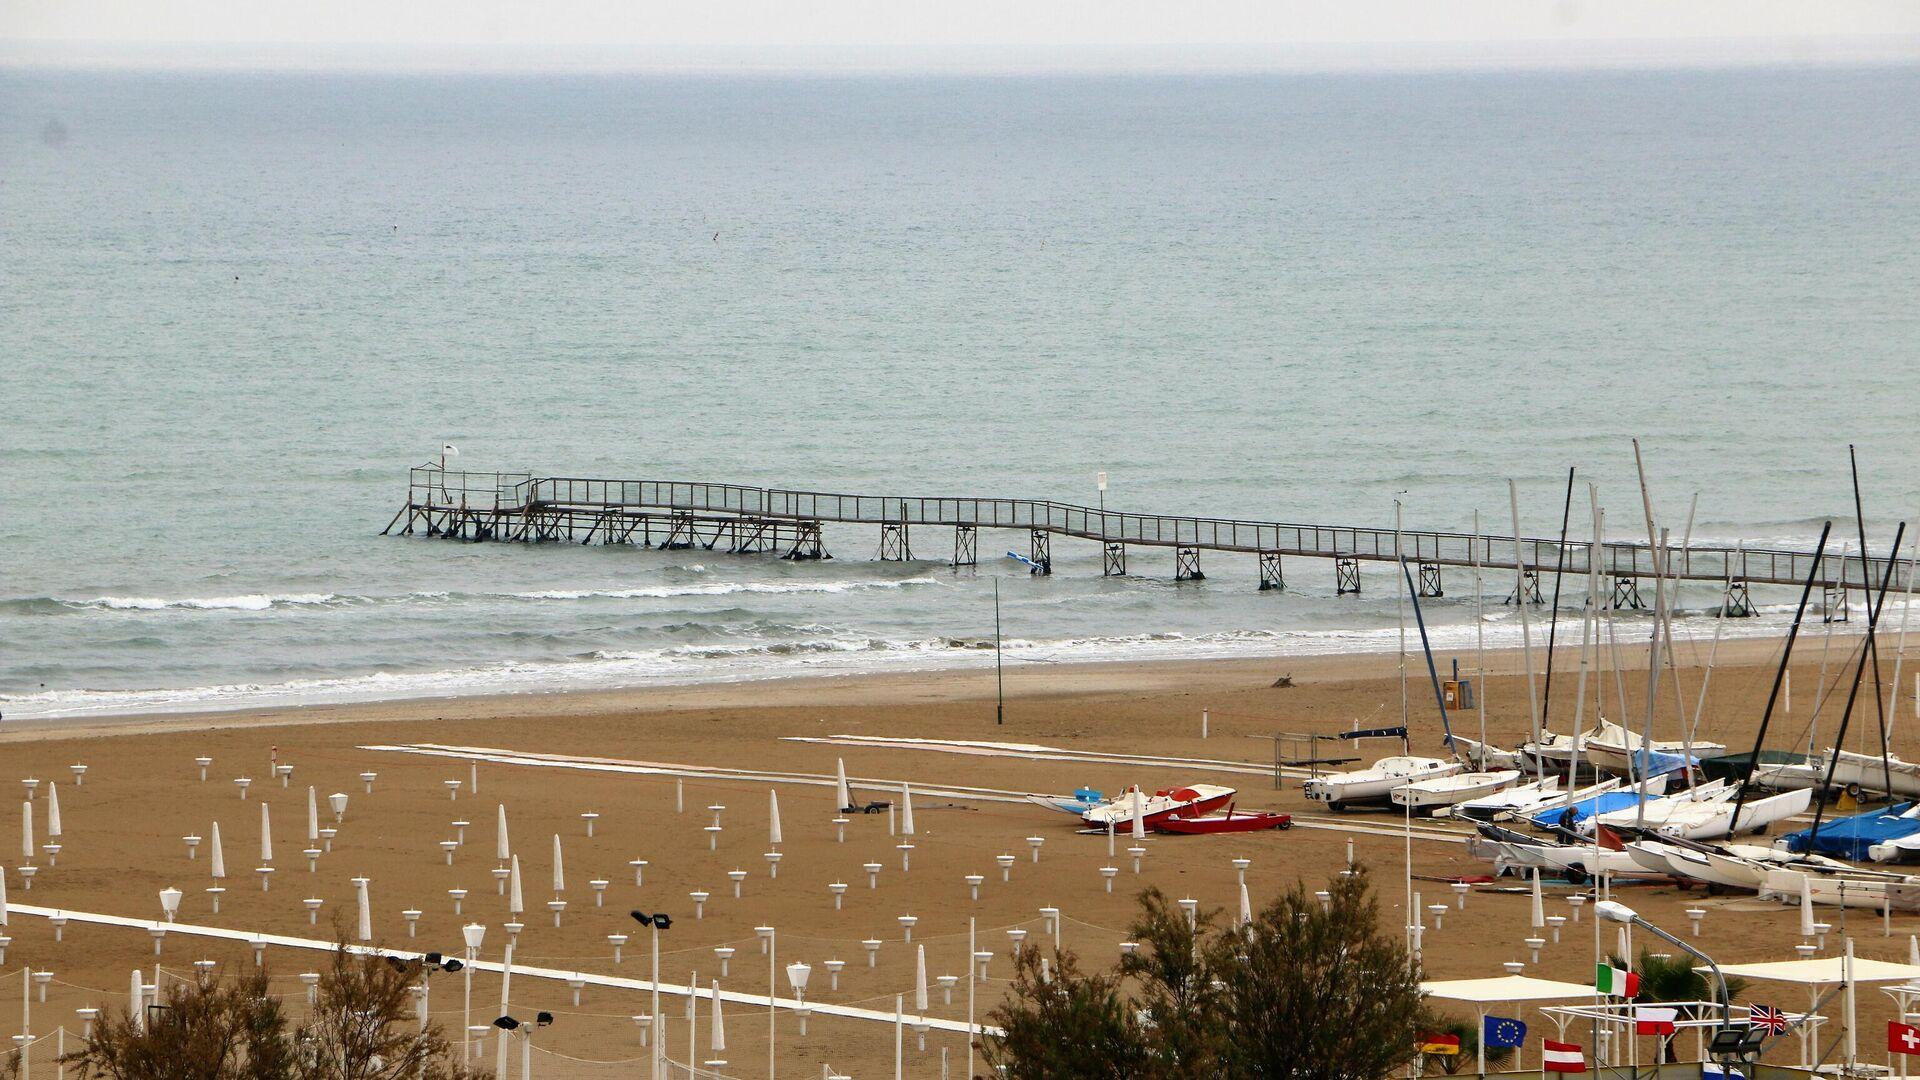 Spiaggia vuota - Sputnik Italia, 1920, 31.05.2021